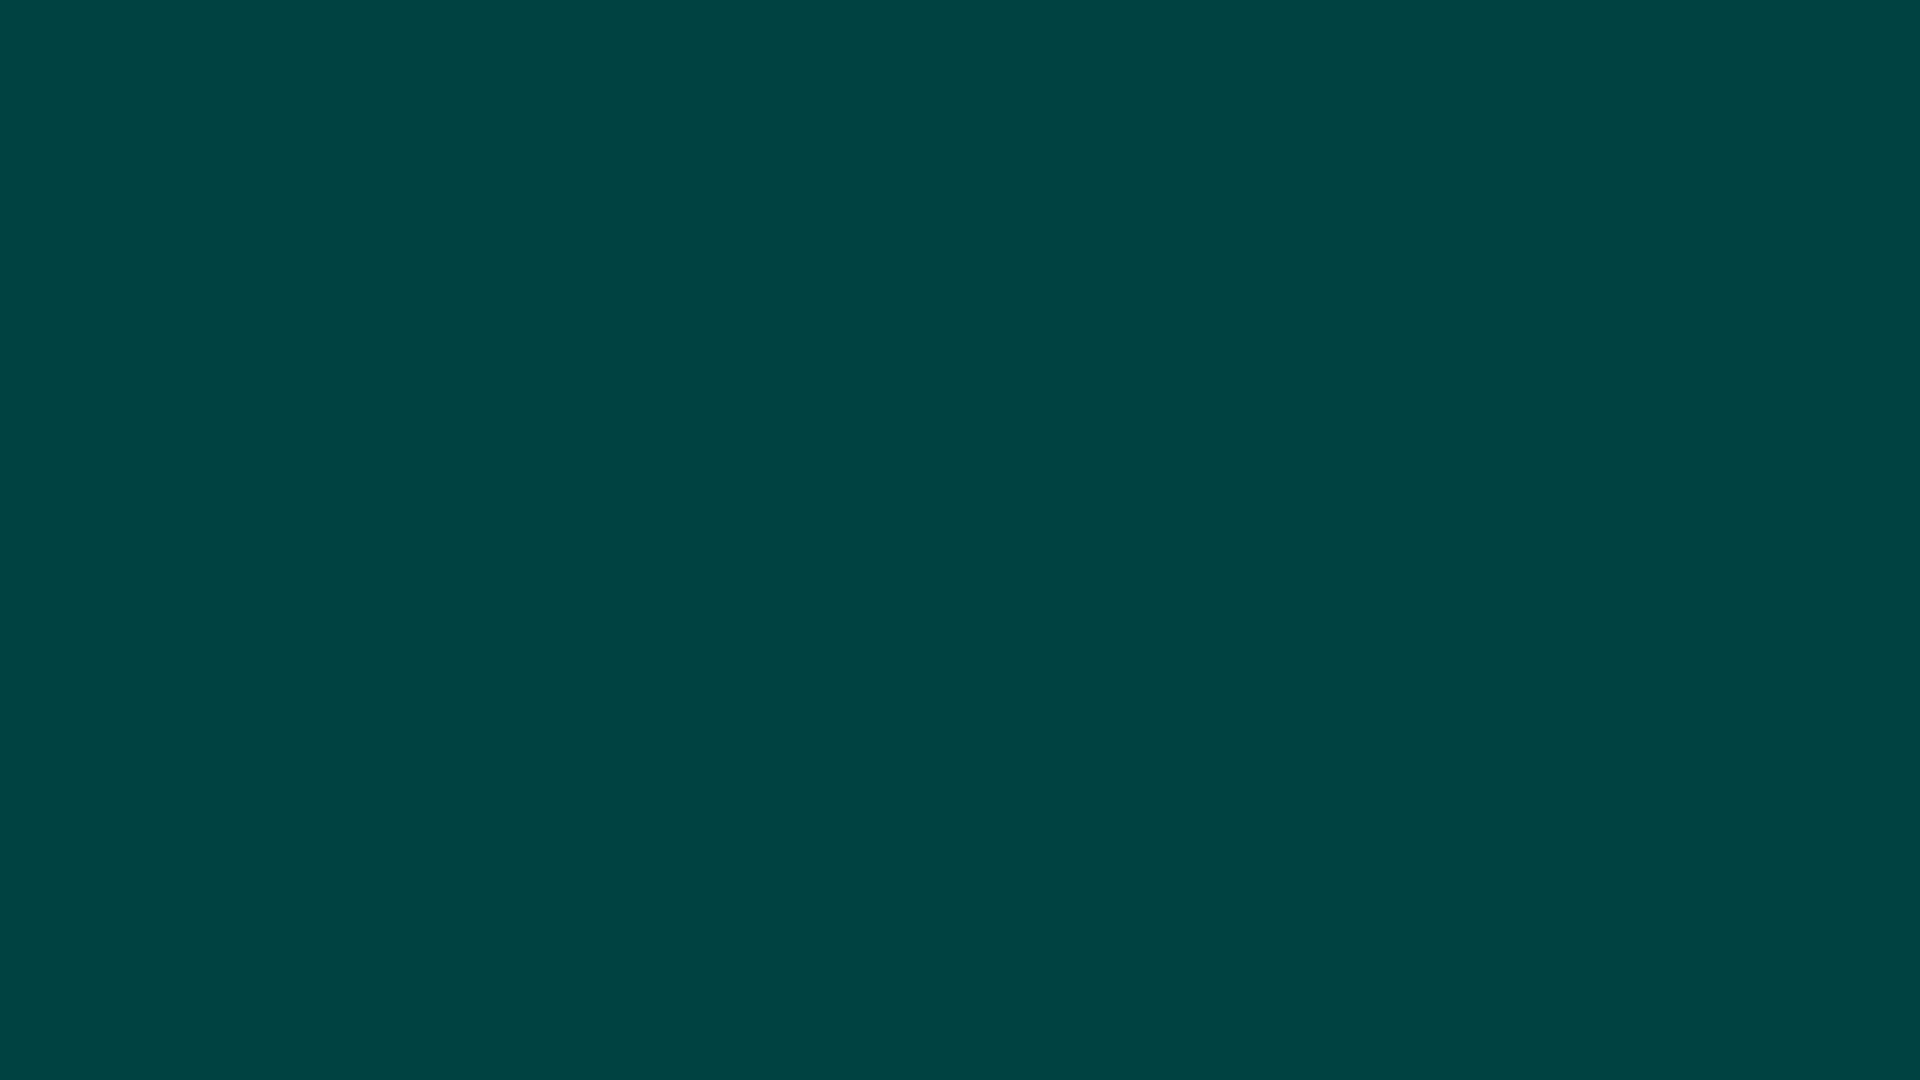 New Wallpaper Color Iphone